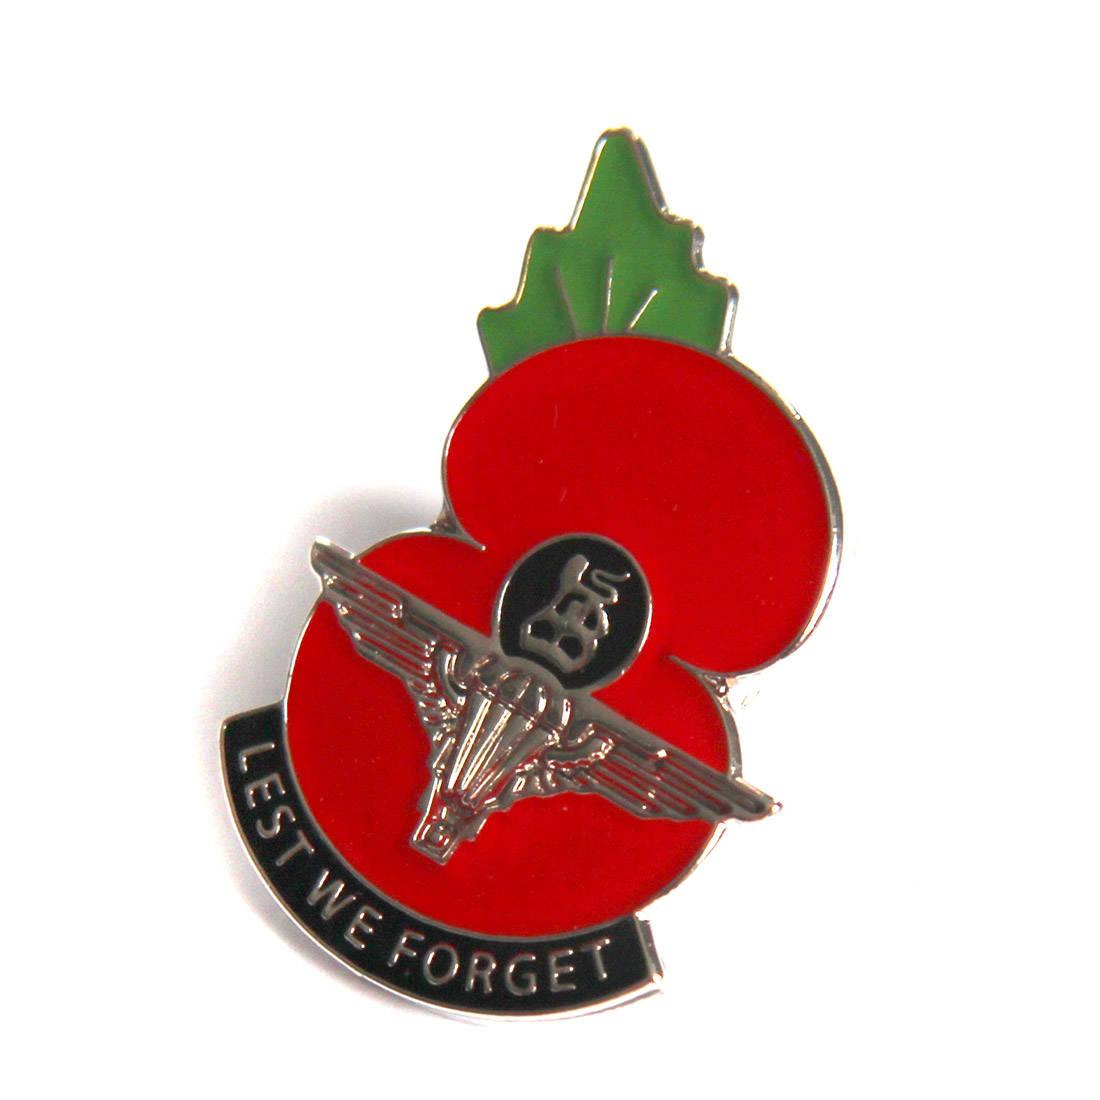 Para Poppy Lapel Badge (Lest We Forget) - The Airborne Shop